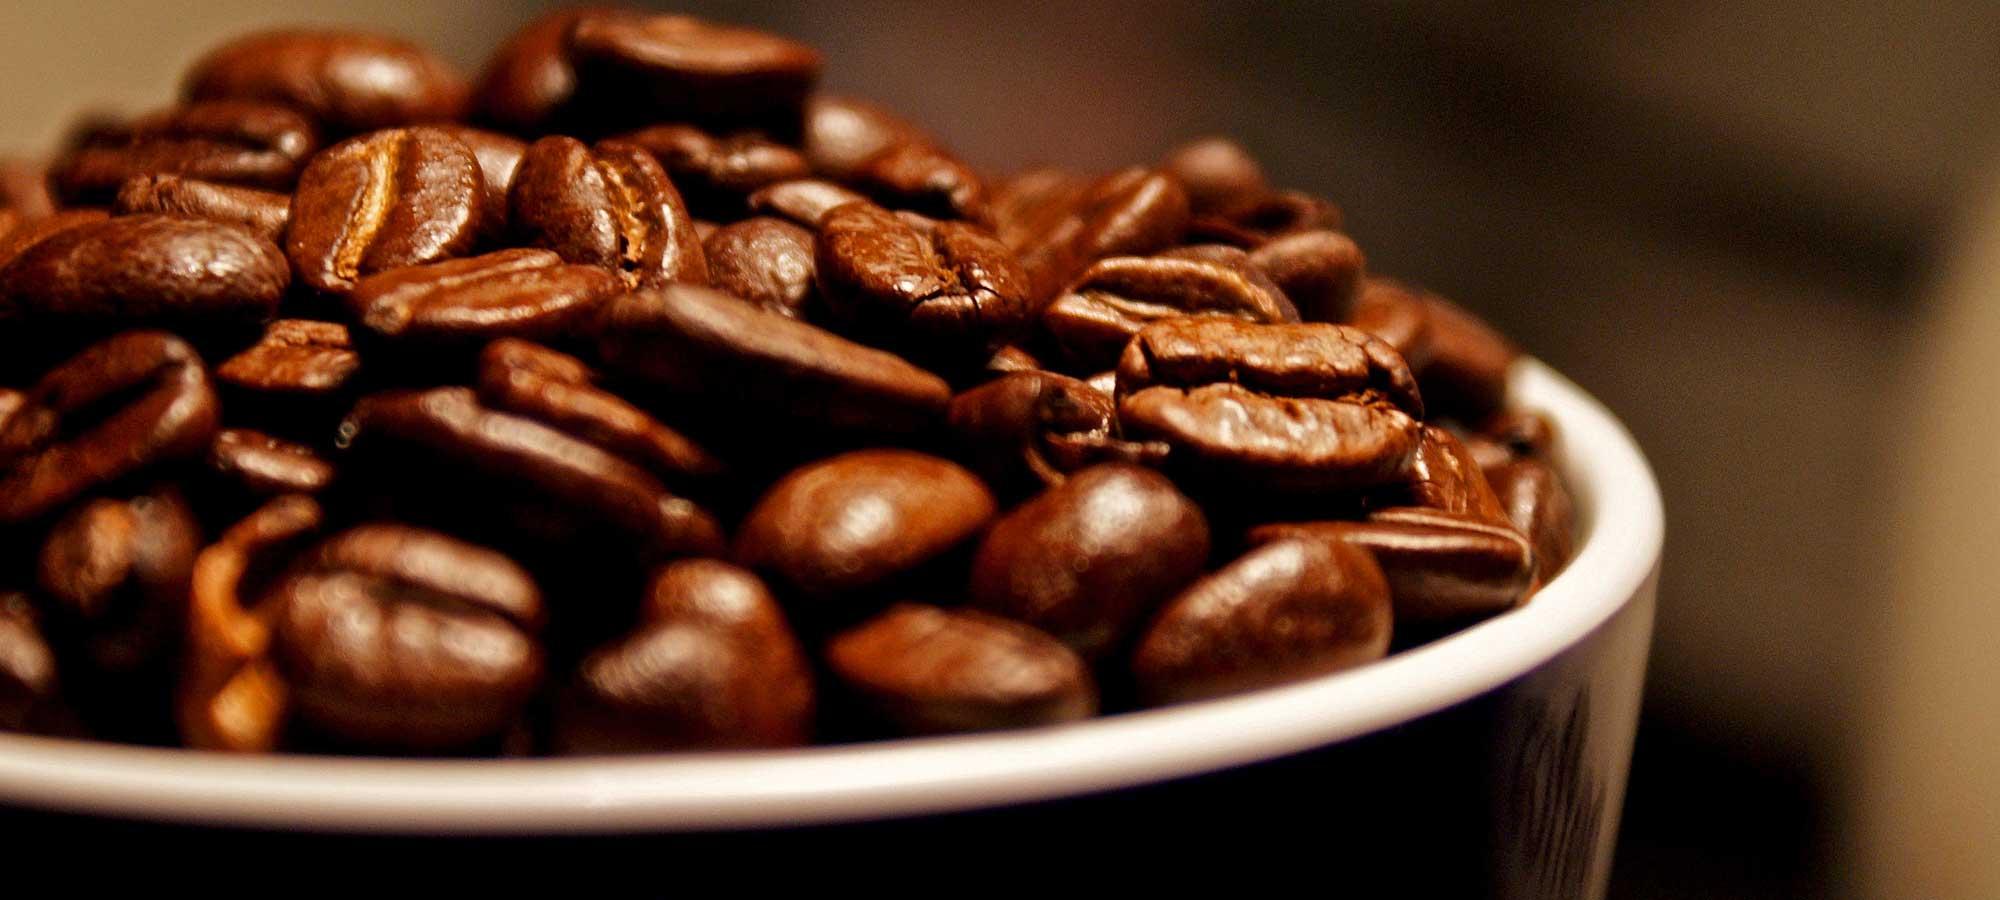 slider-coffee-01 Metabolizma Hızlandırma Yolları